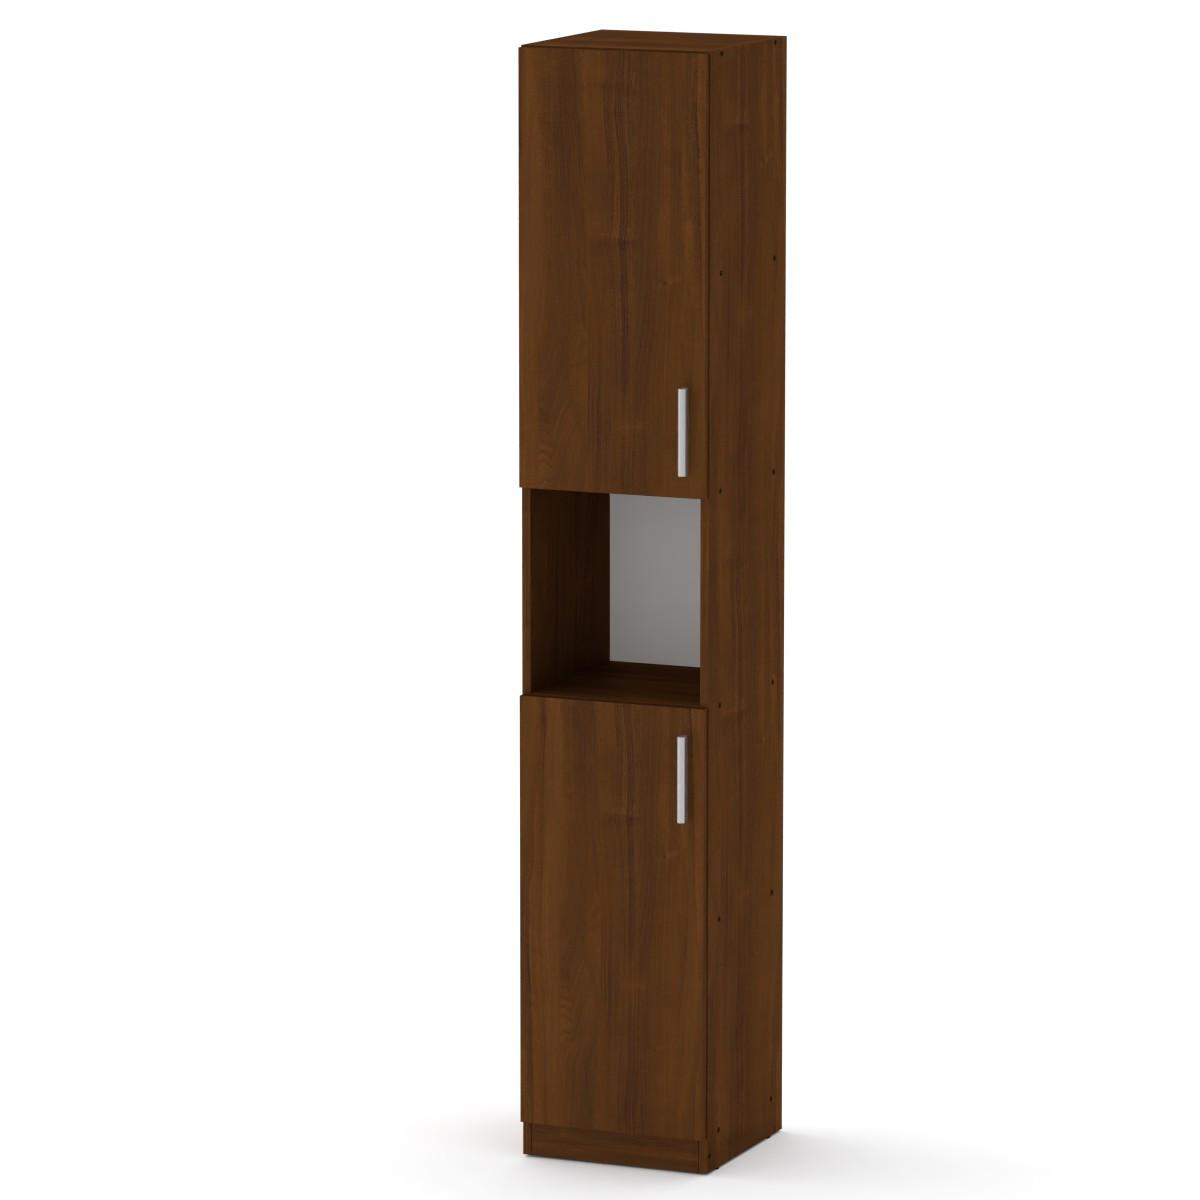 Шкаф книжный КШ-10 орех экко Компанит (35х37х195 см)